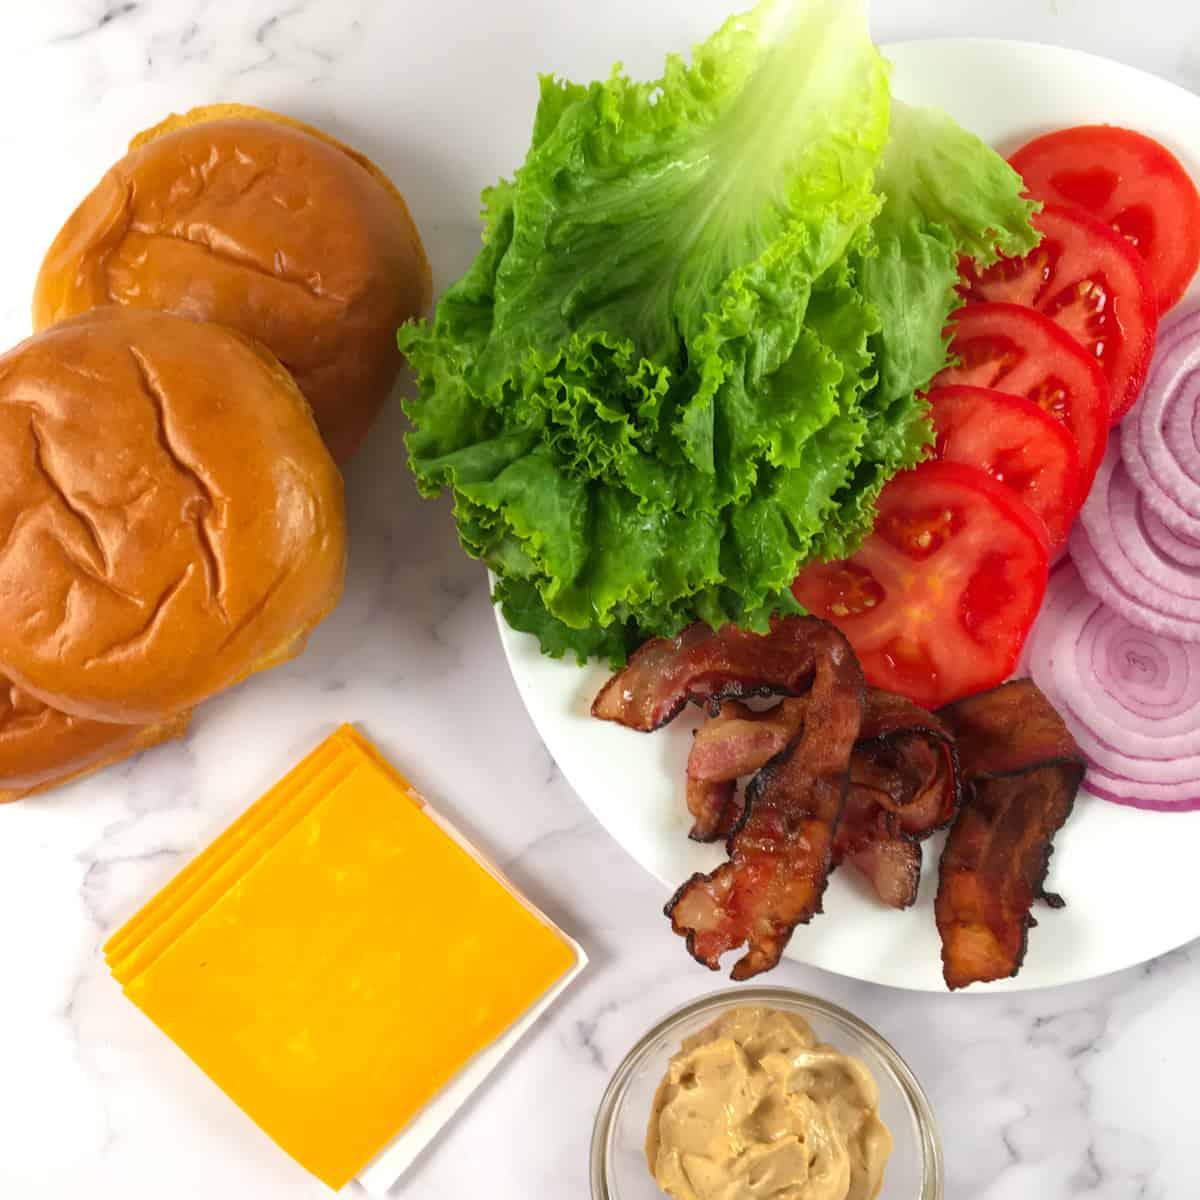 hamburger toppings ingredients